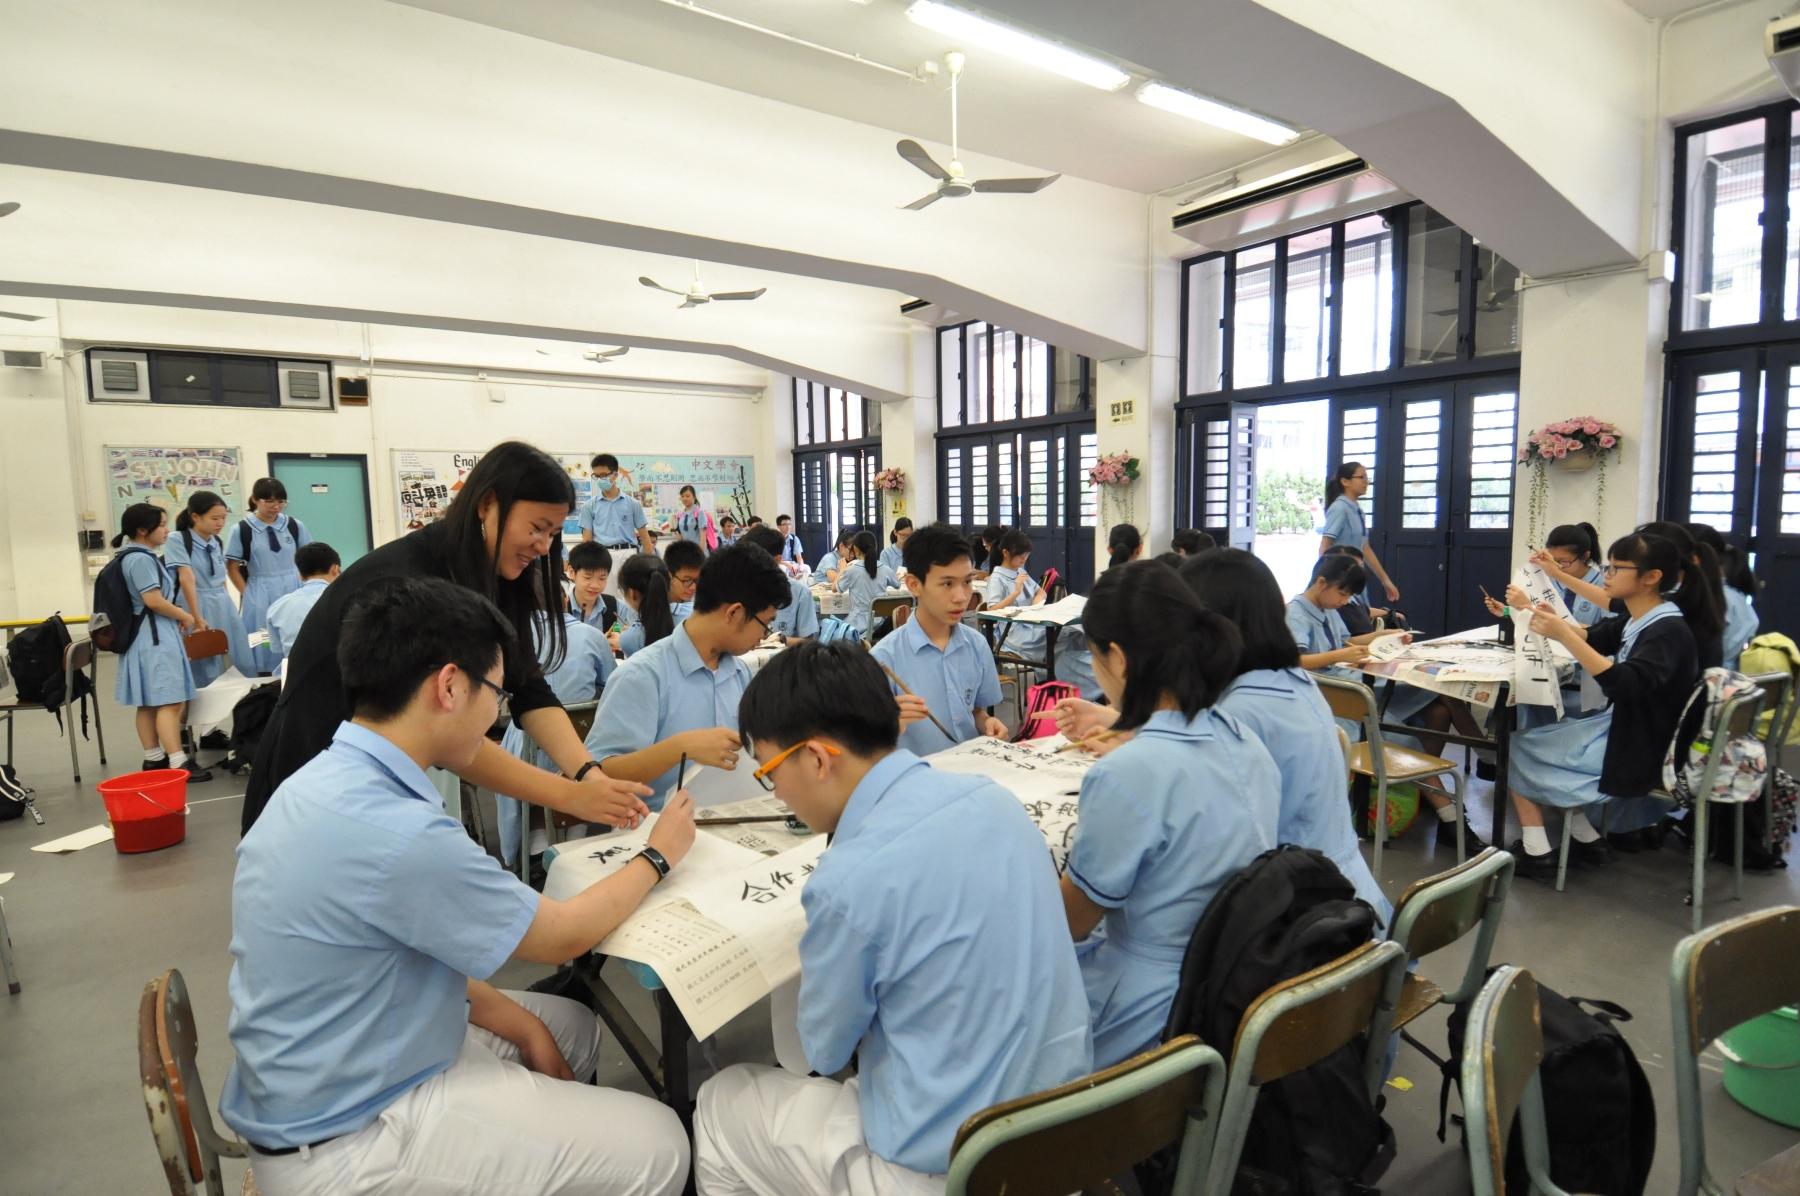 http://www.npc.edu.hk/sites/default/files/dsc_0219_1.jpg